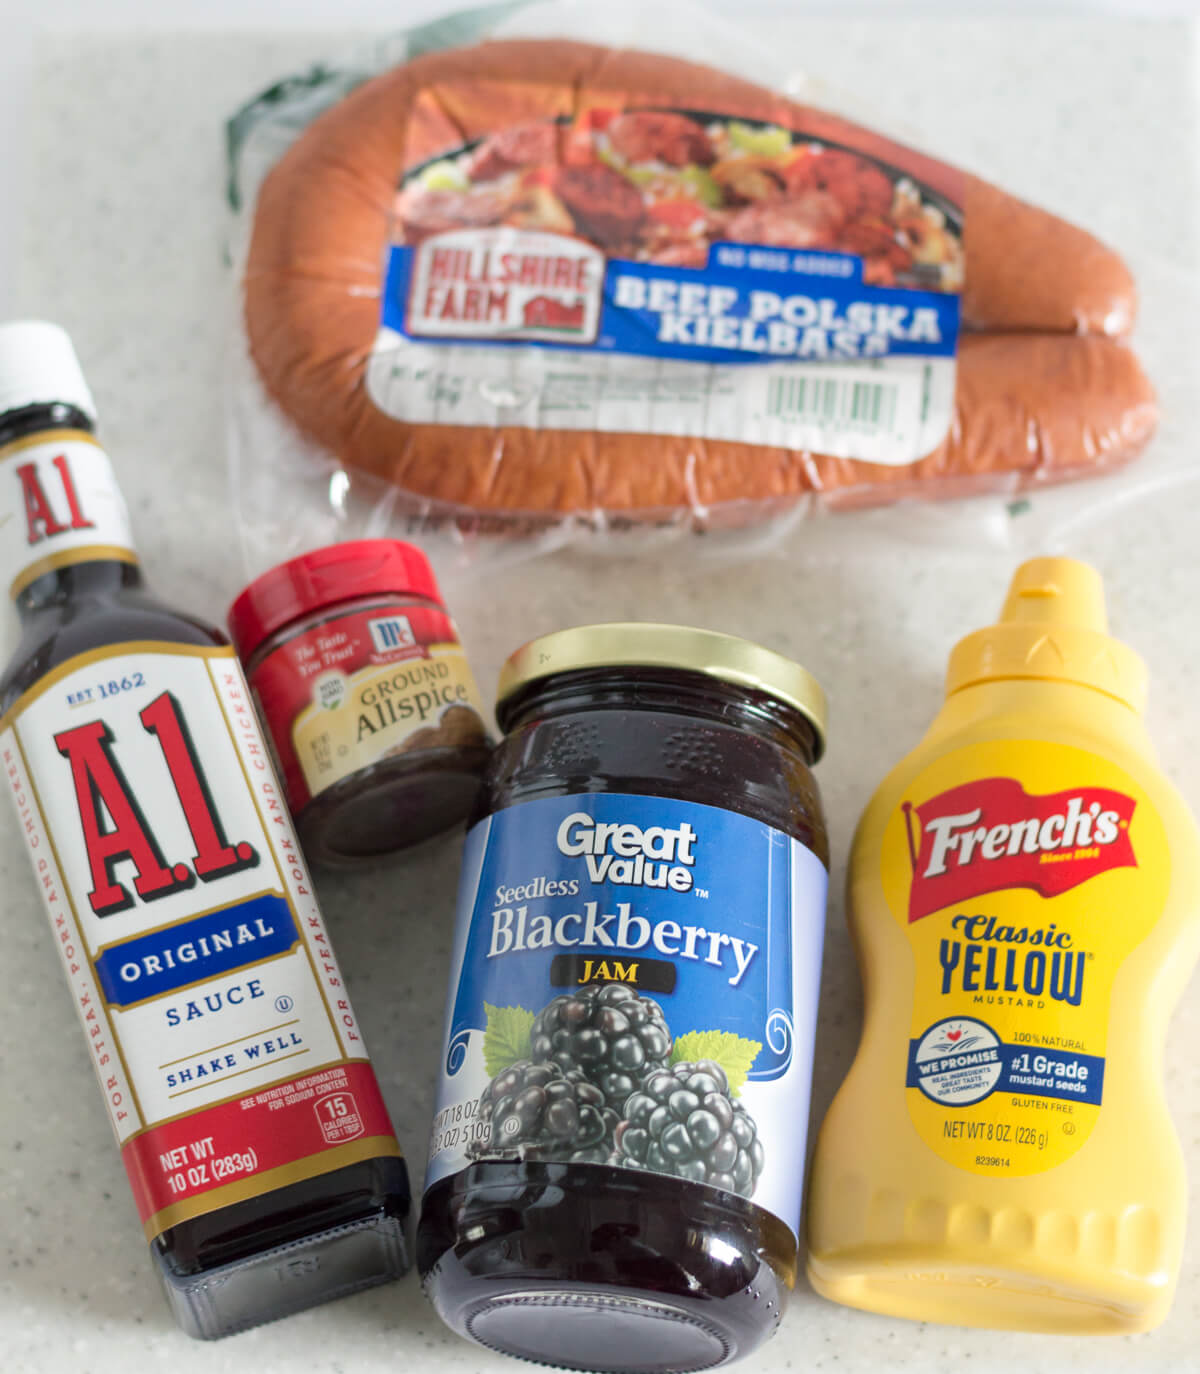 Slow cooker kielbasa bites ingredients   the home i create